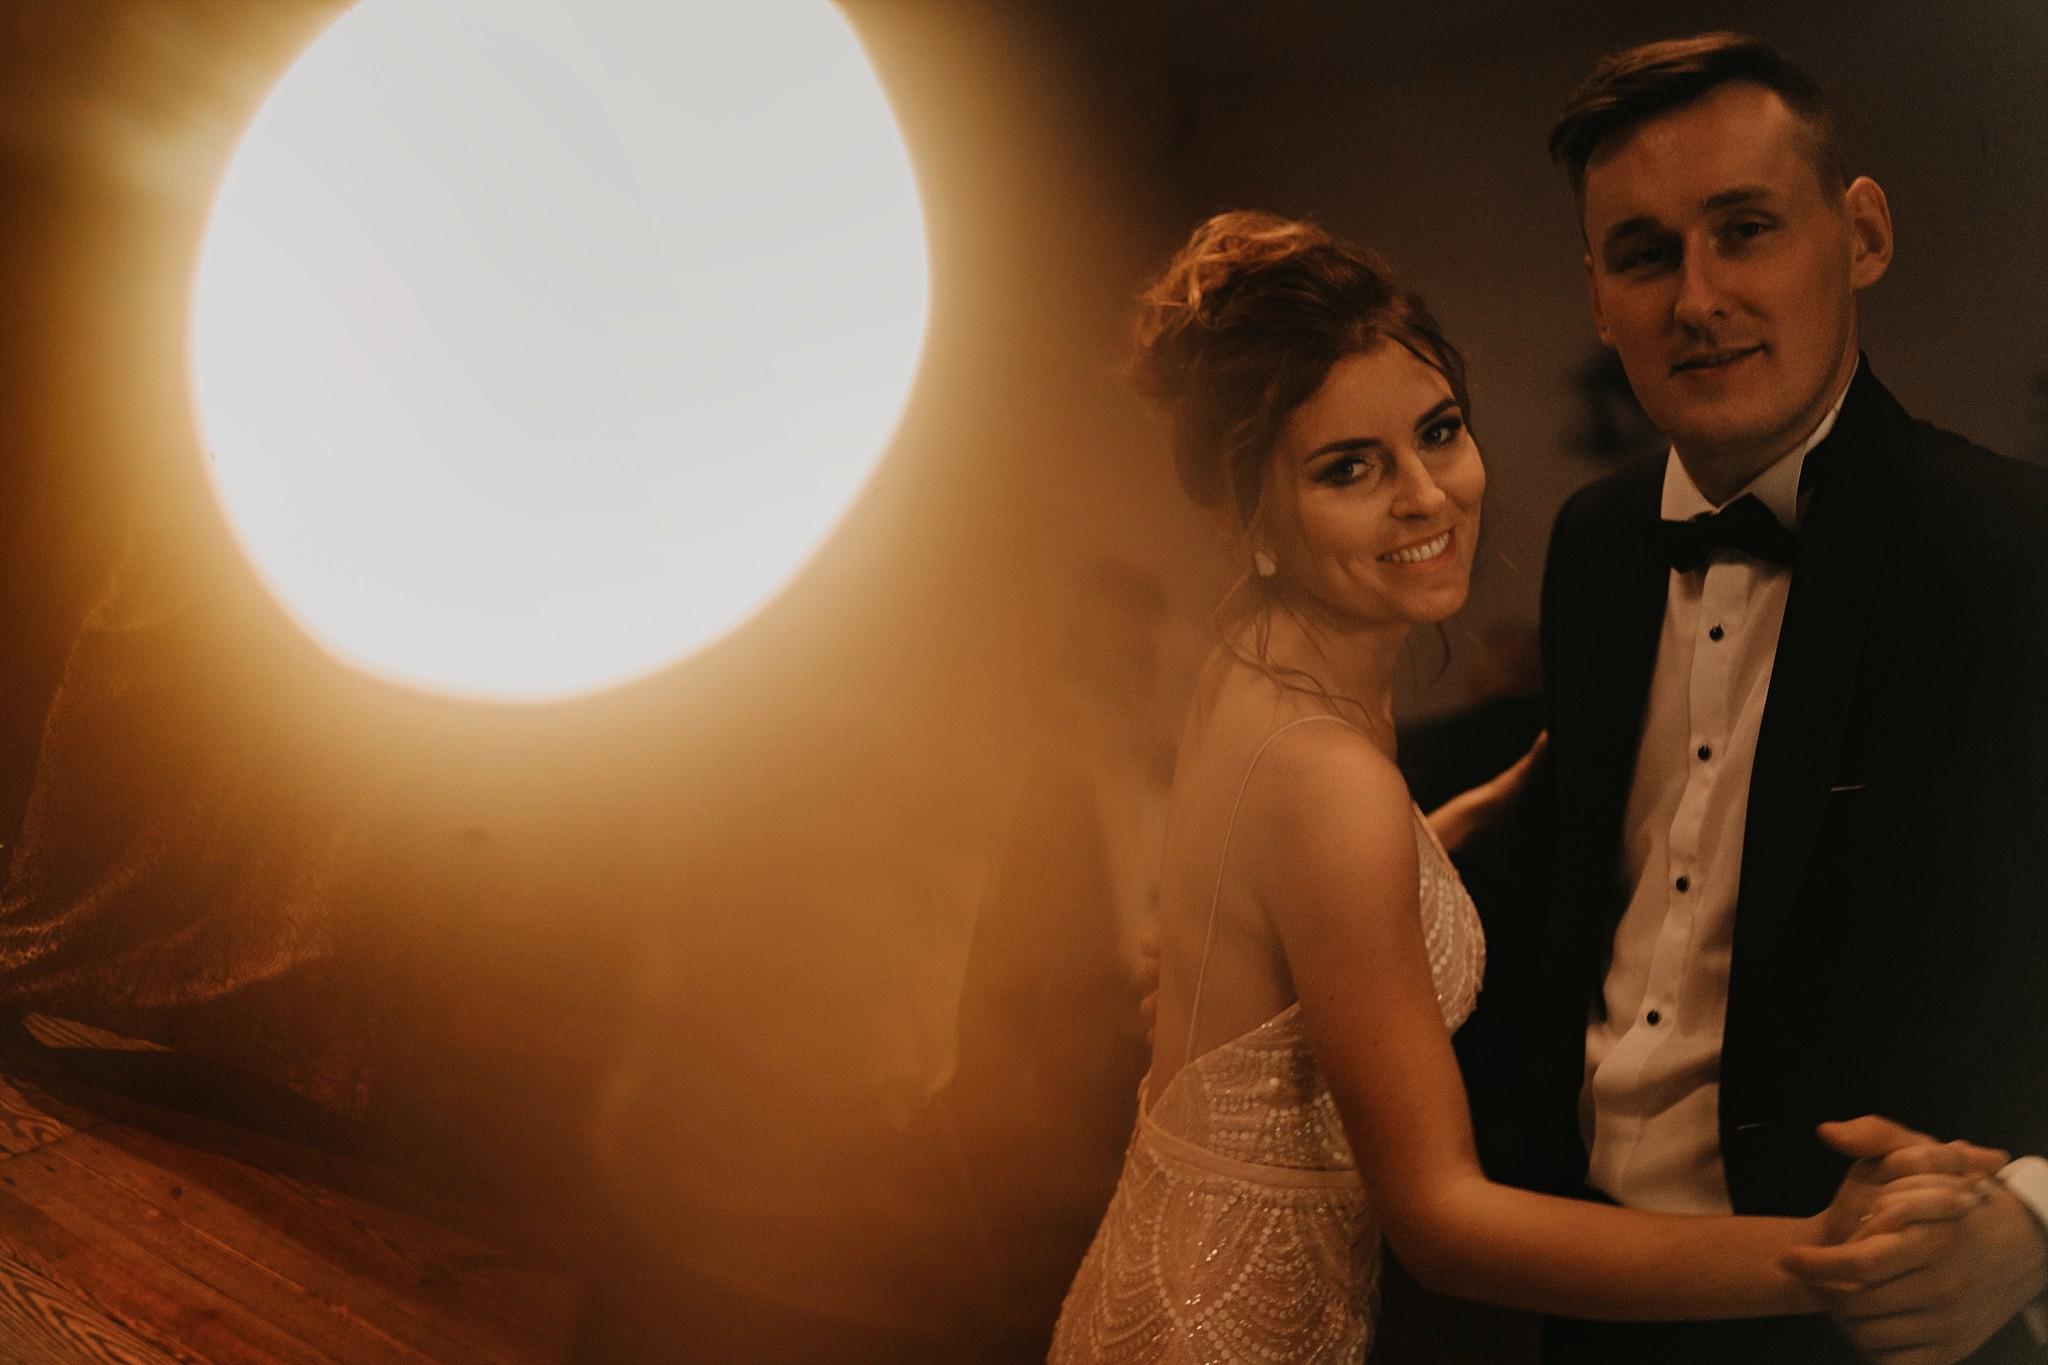 fotograf poznan wesele dobra truskawka piekne wesele pod poznaniem wesele w dobrej truskawce piekna para mloda slub marzen slub koronawirus slub listopad wesele koronawirus 490